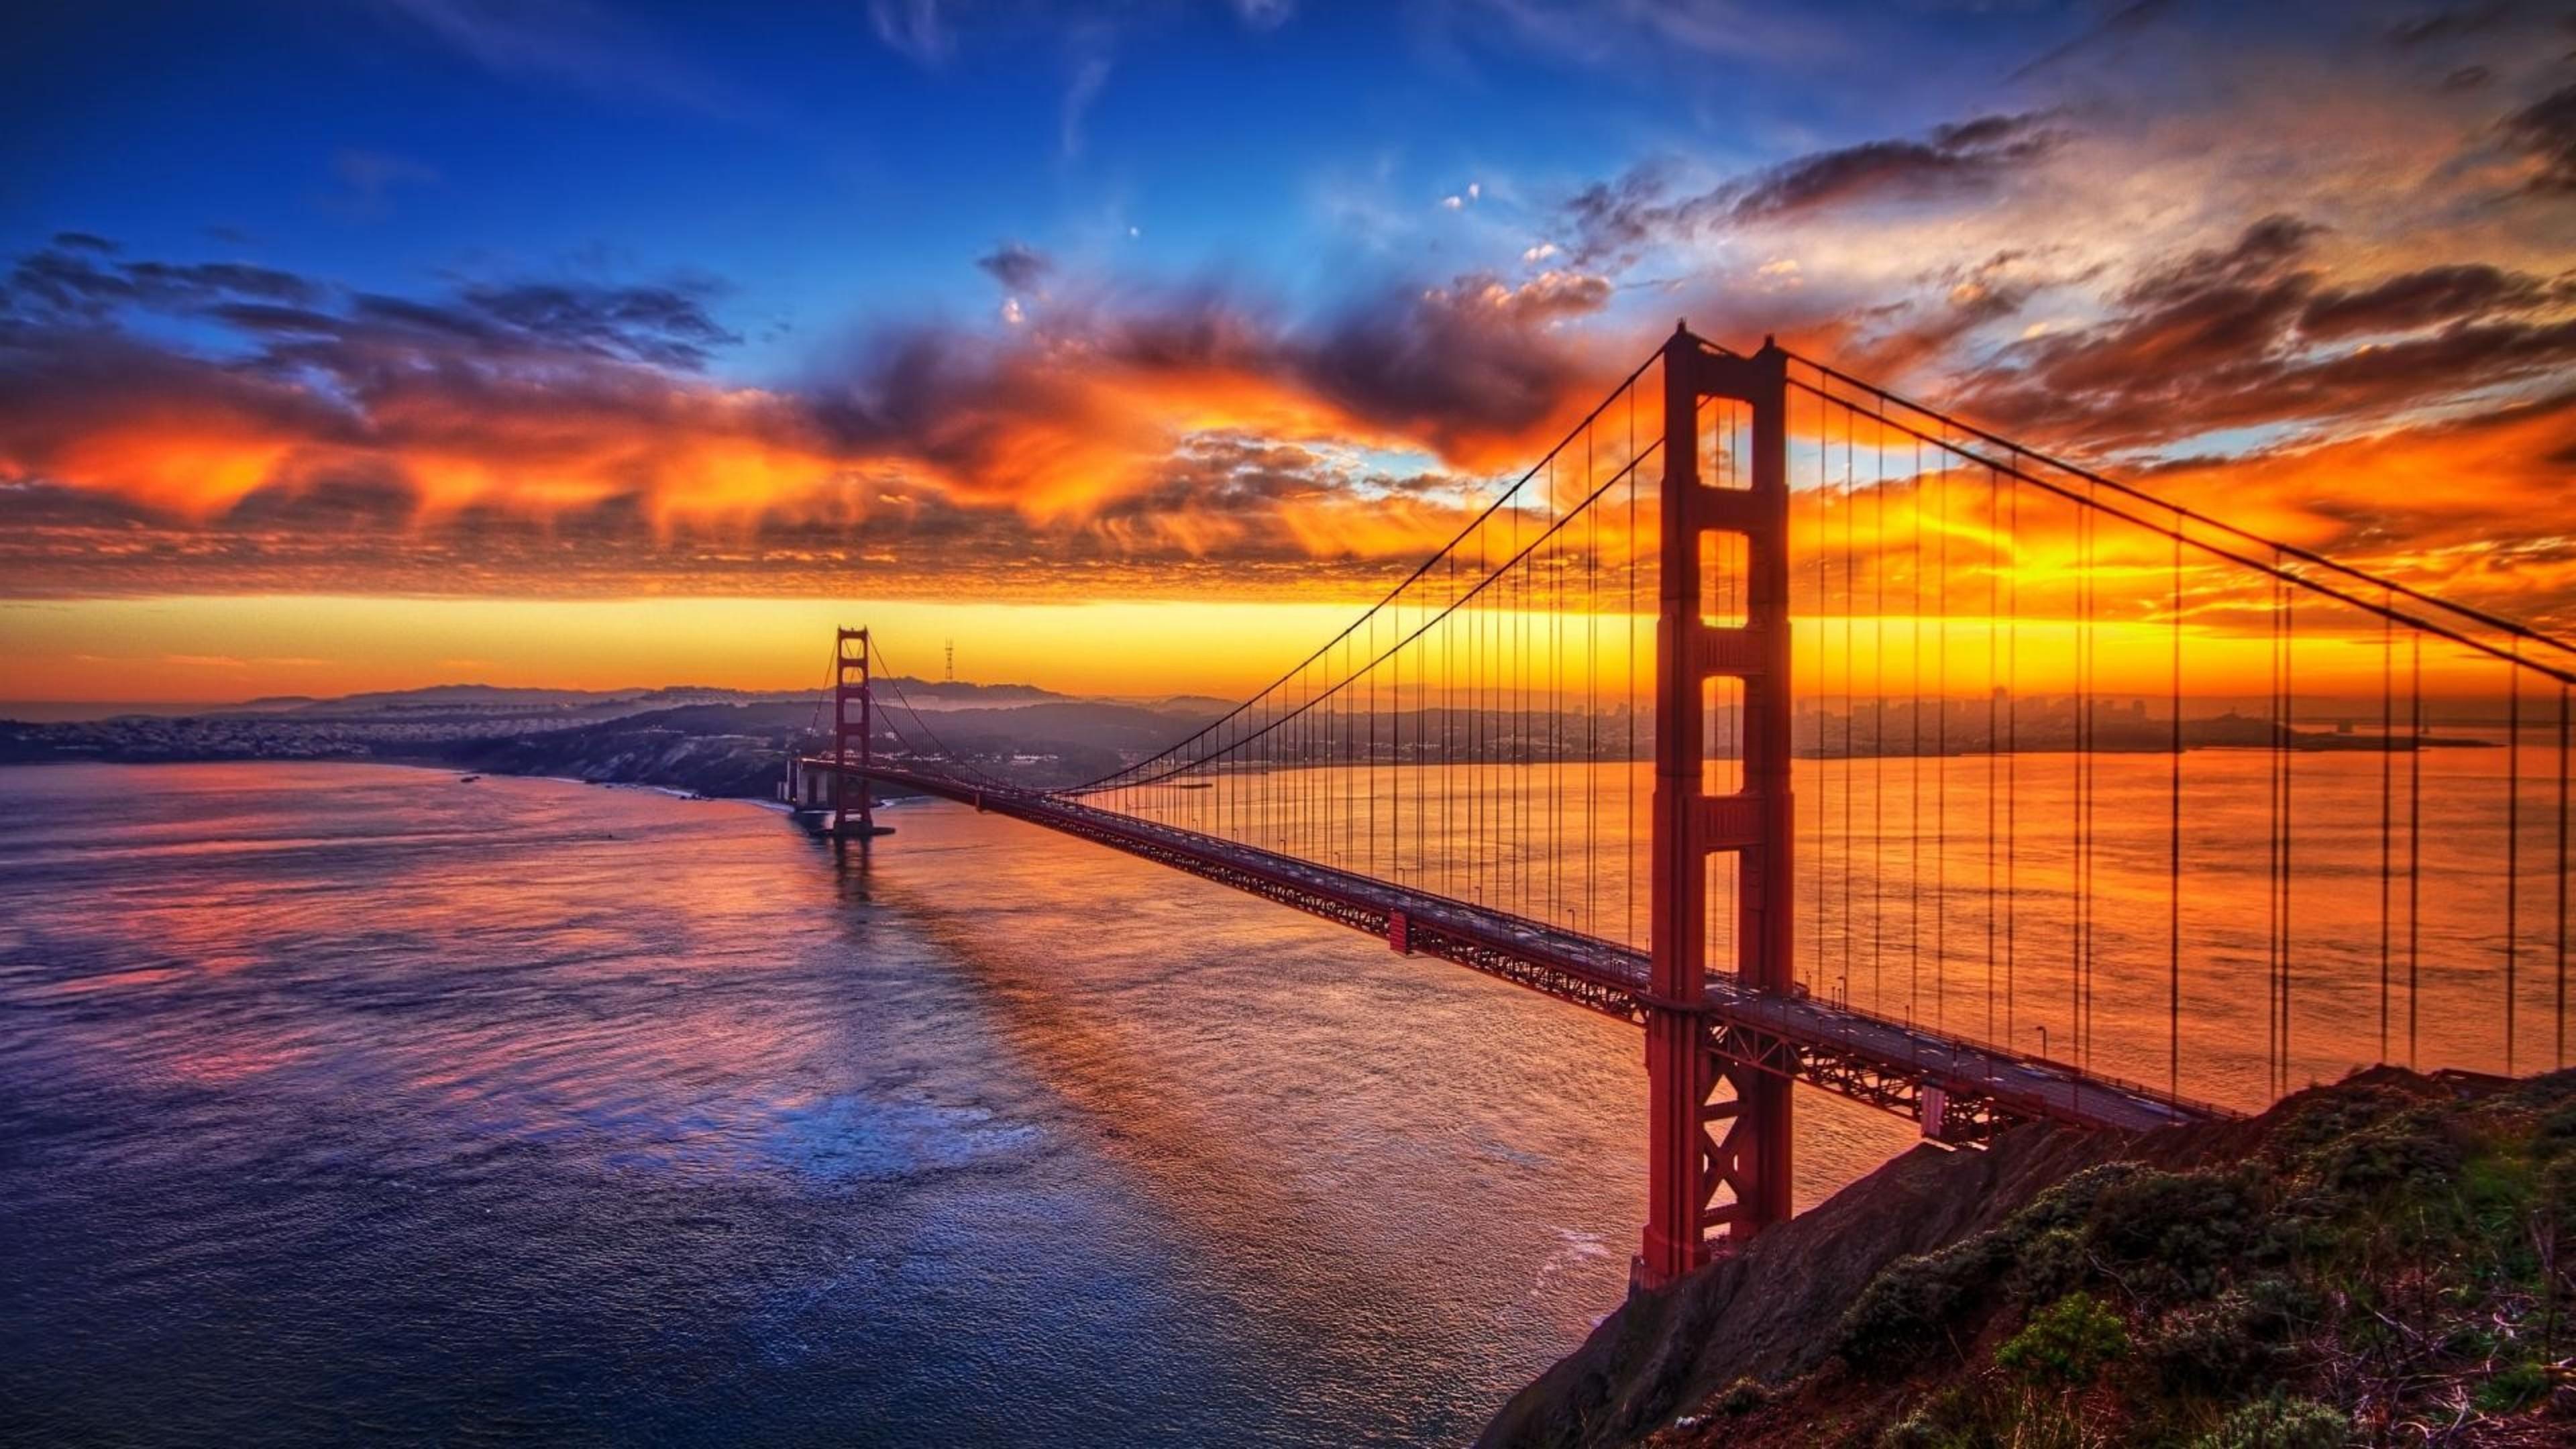 bridge sunset sky 4k 1540131383 - Bridge Sunset Sky 4k - sunset wallpapers, sky wallpapers, nature wallpapers, bridge wallpapers